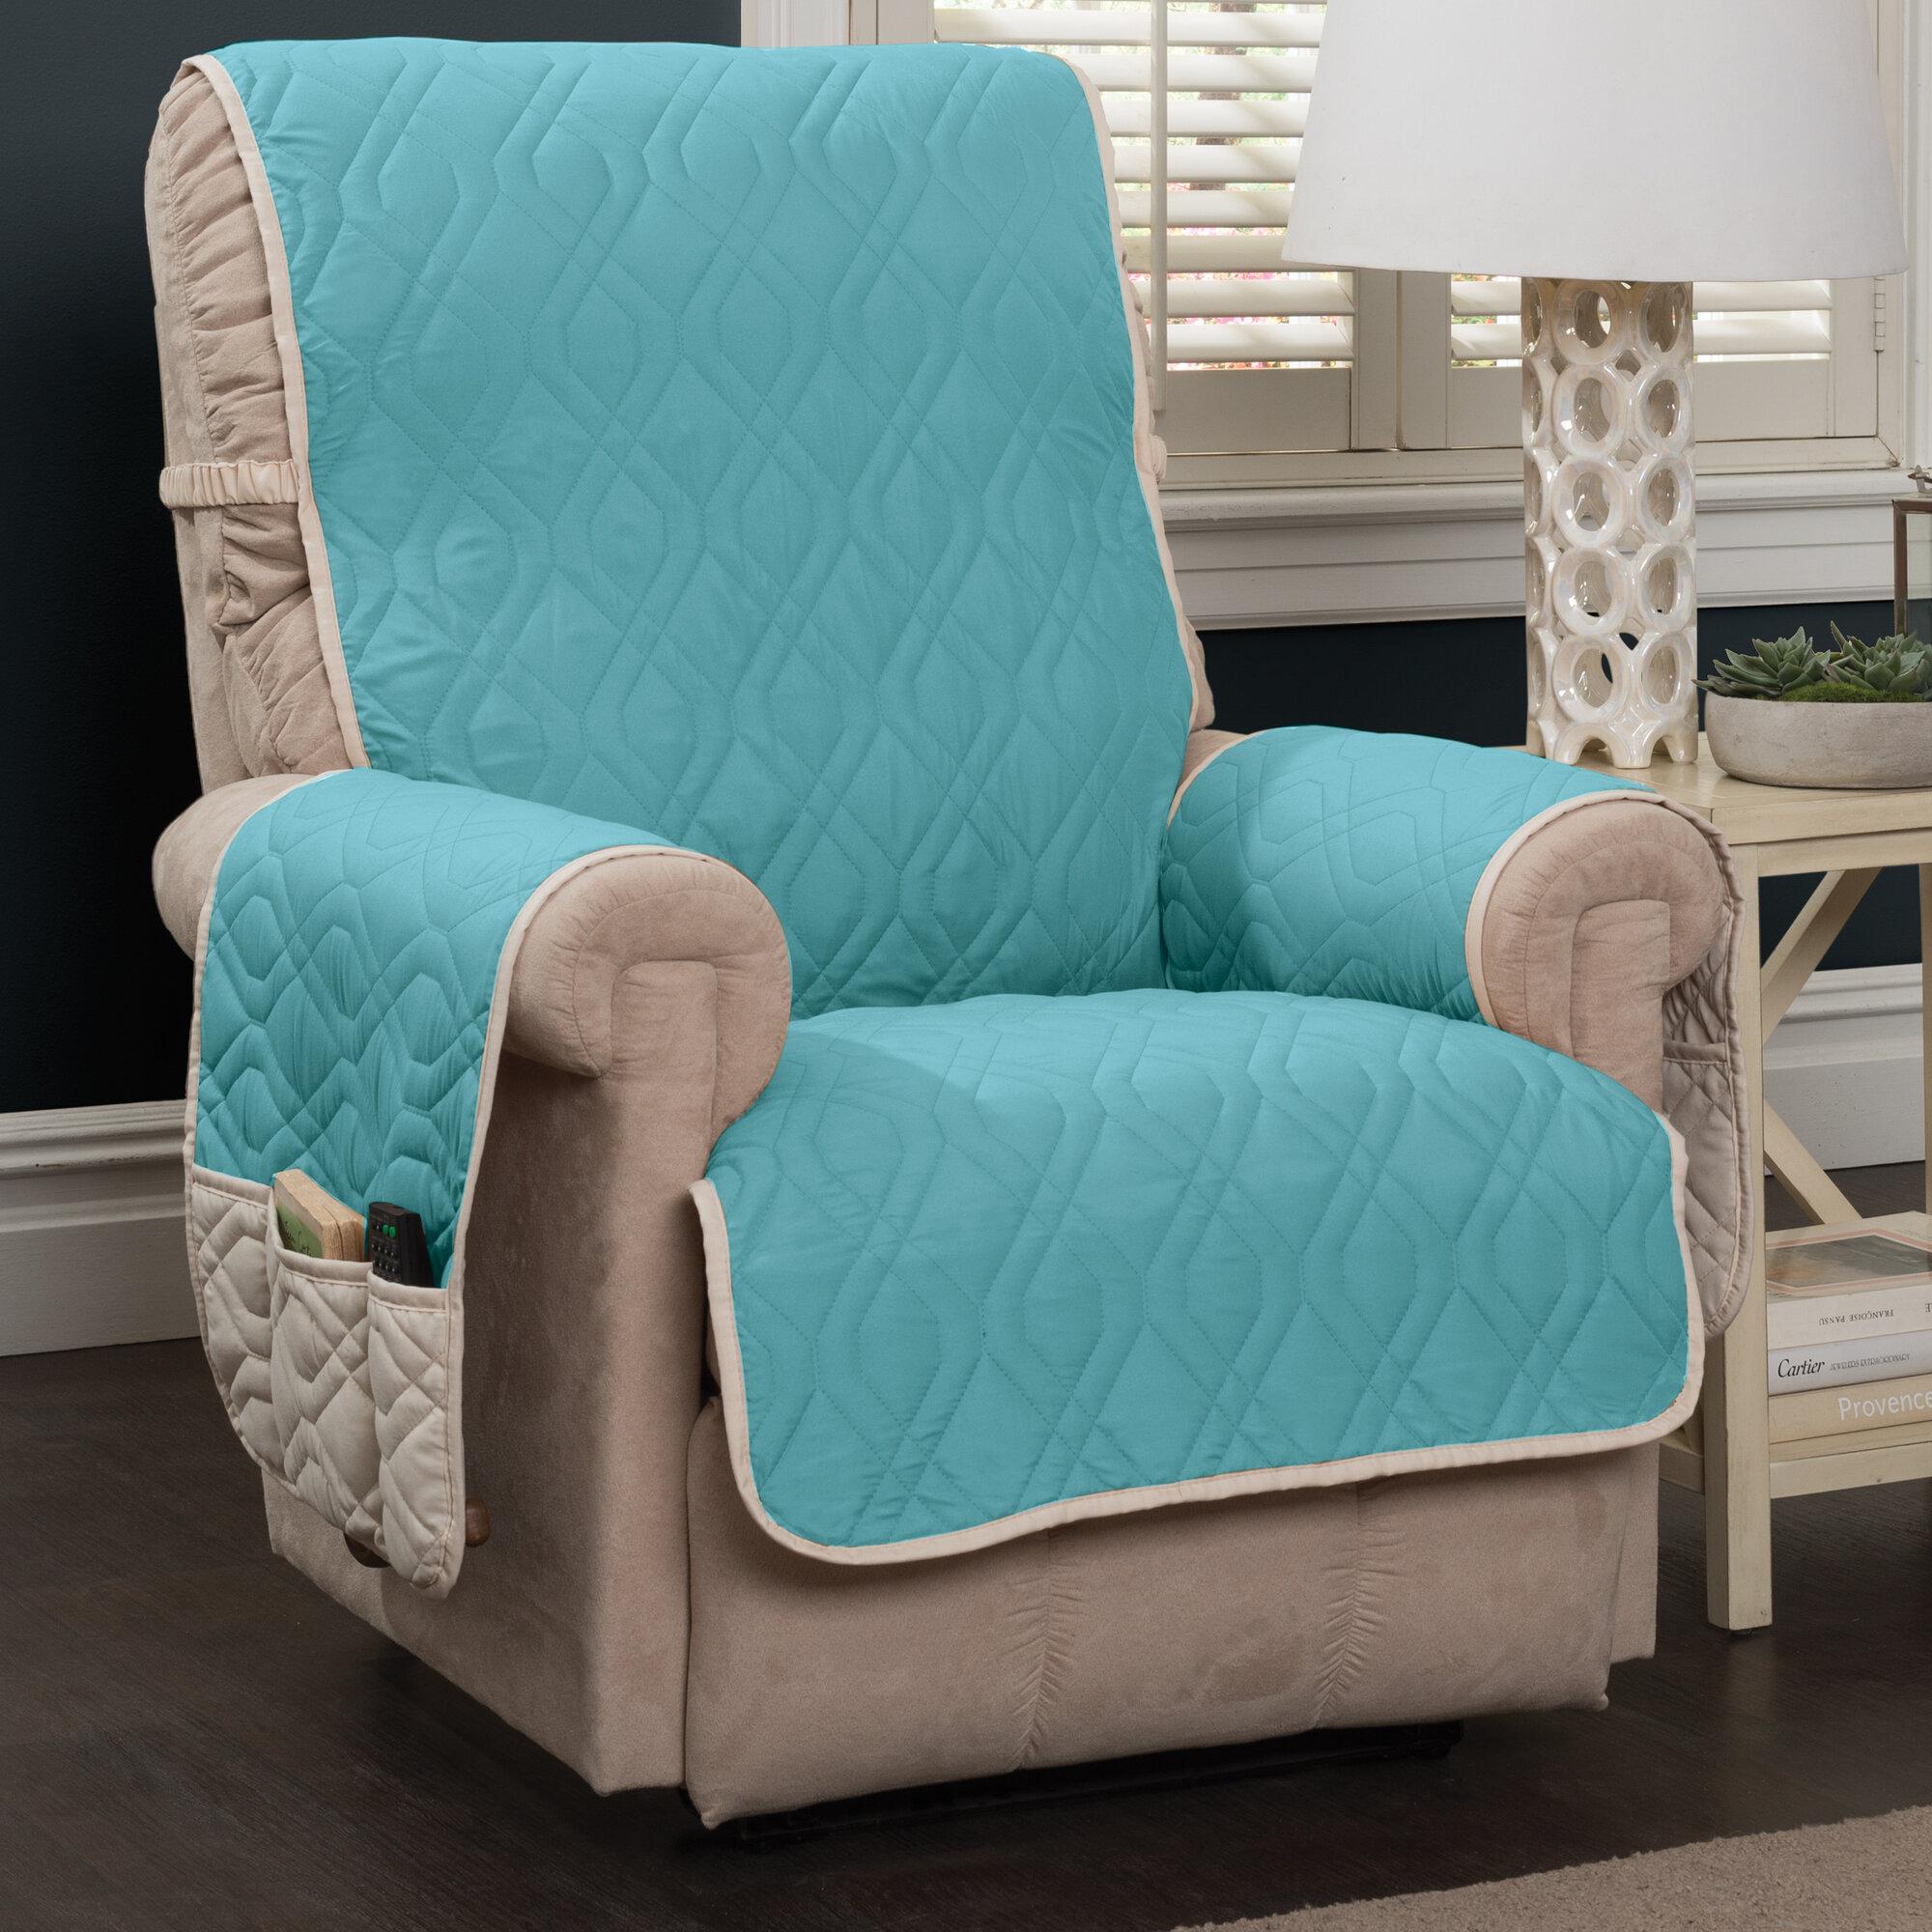 Wayfair Couch Slipcovers